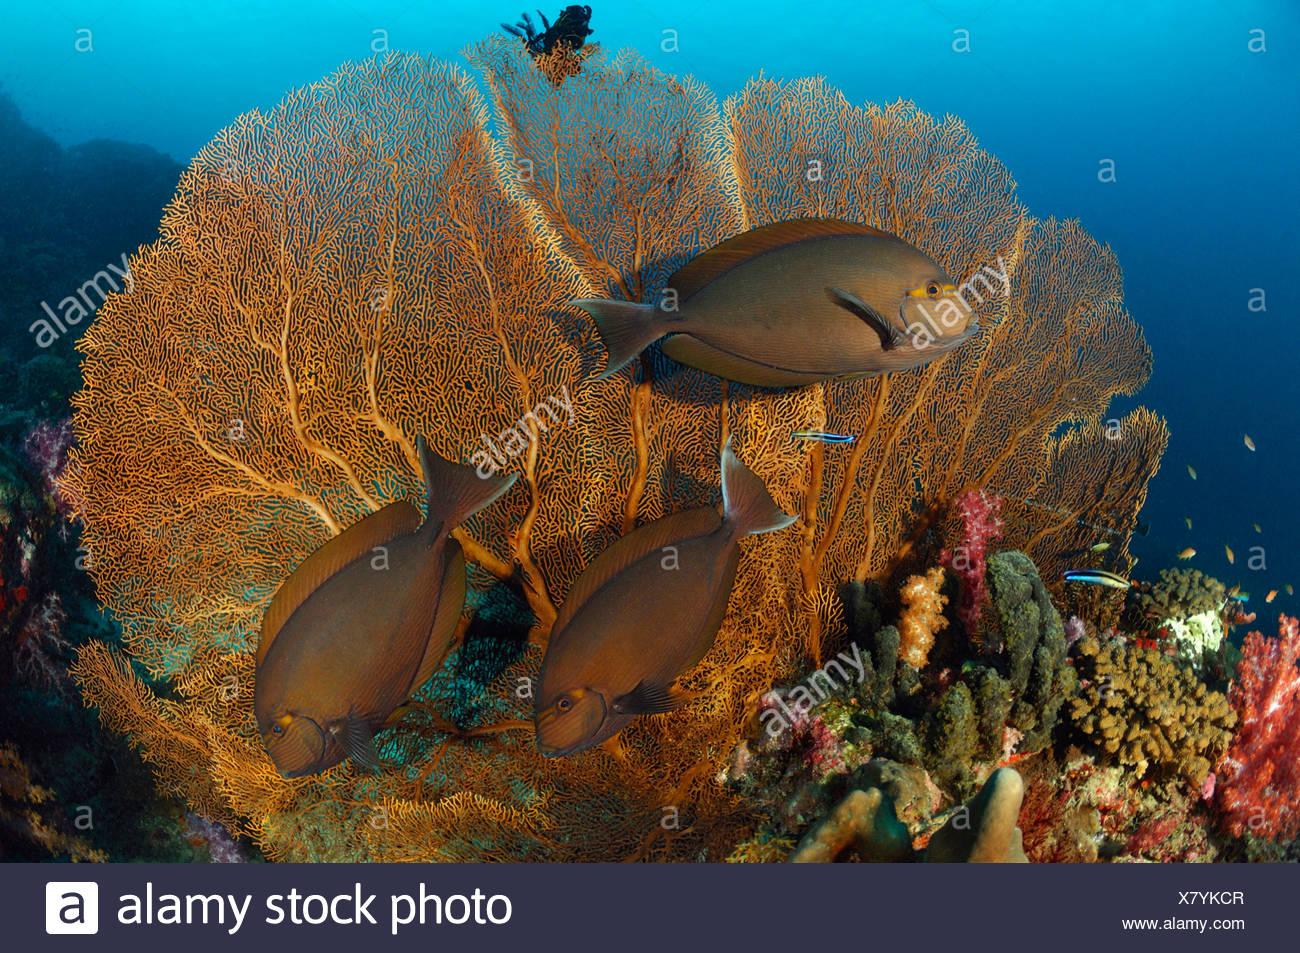 Surgeonfish in Coral Reef, Acanthurus sp., Similan Islands, Thailand - Stock Image